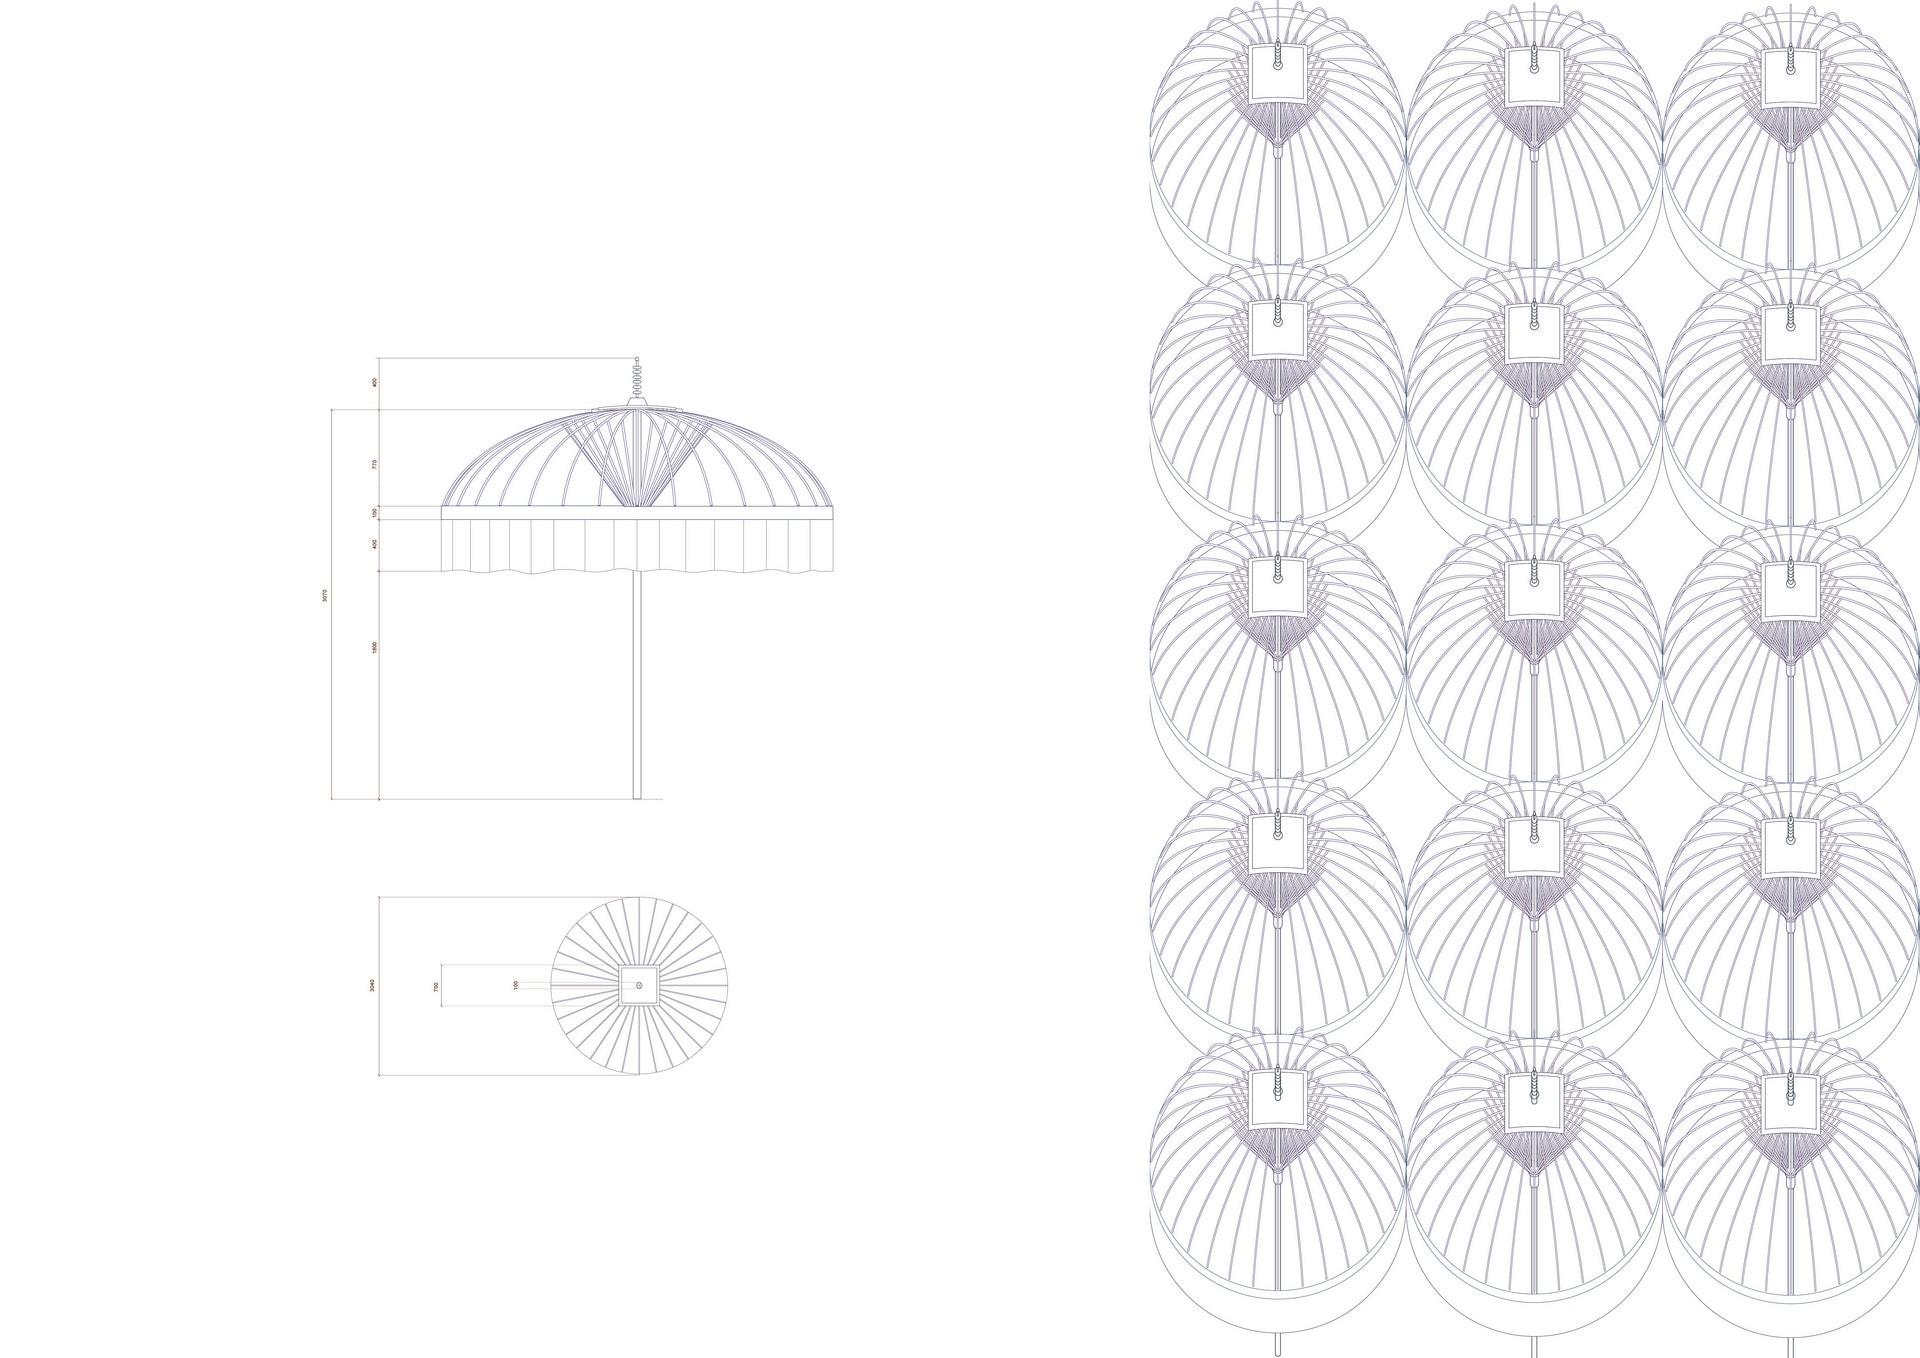 Asante Umbrella - Form analysis